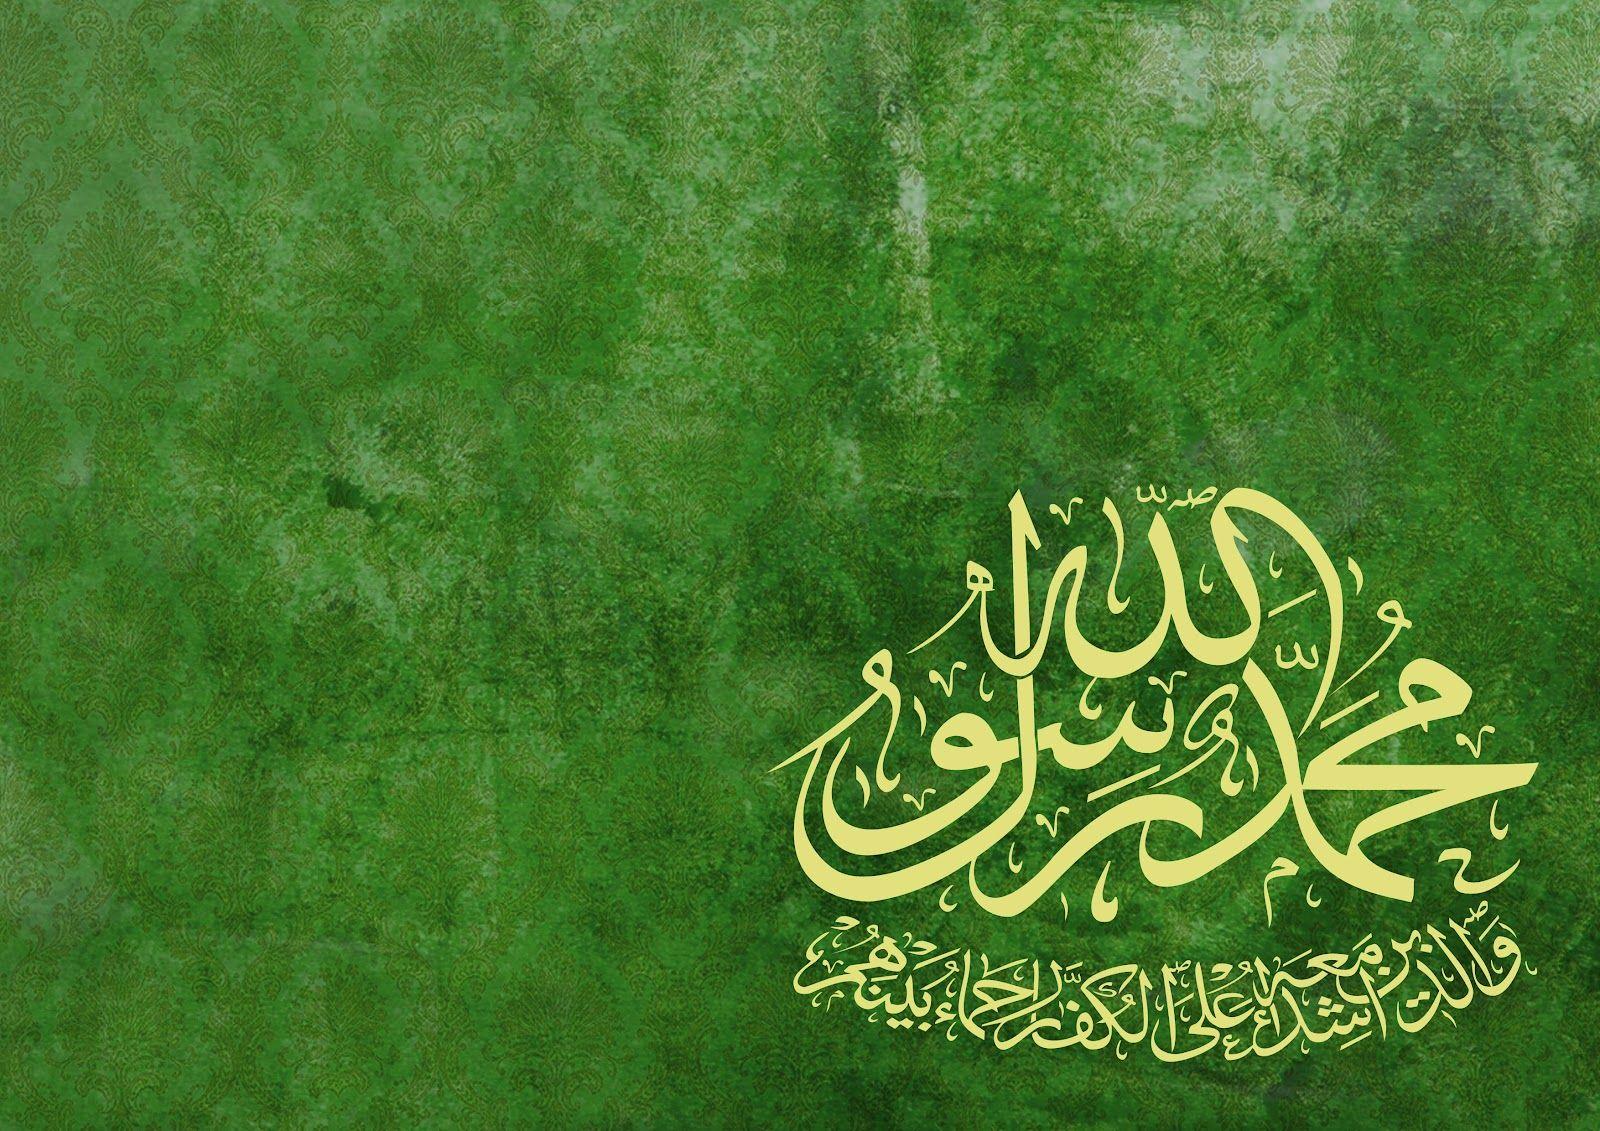 Islamic Calligraphy HD Image Wallpaper 2319 High